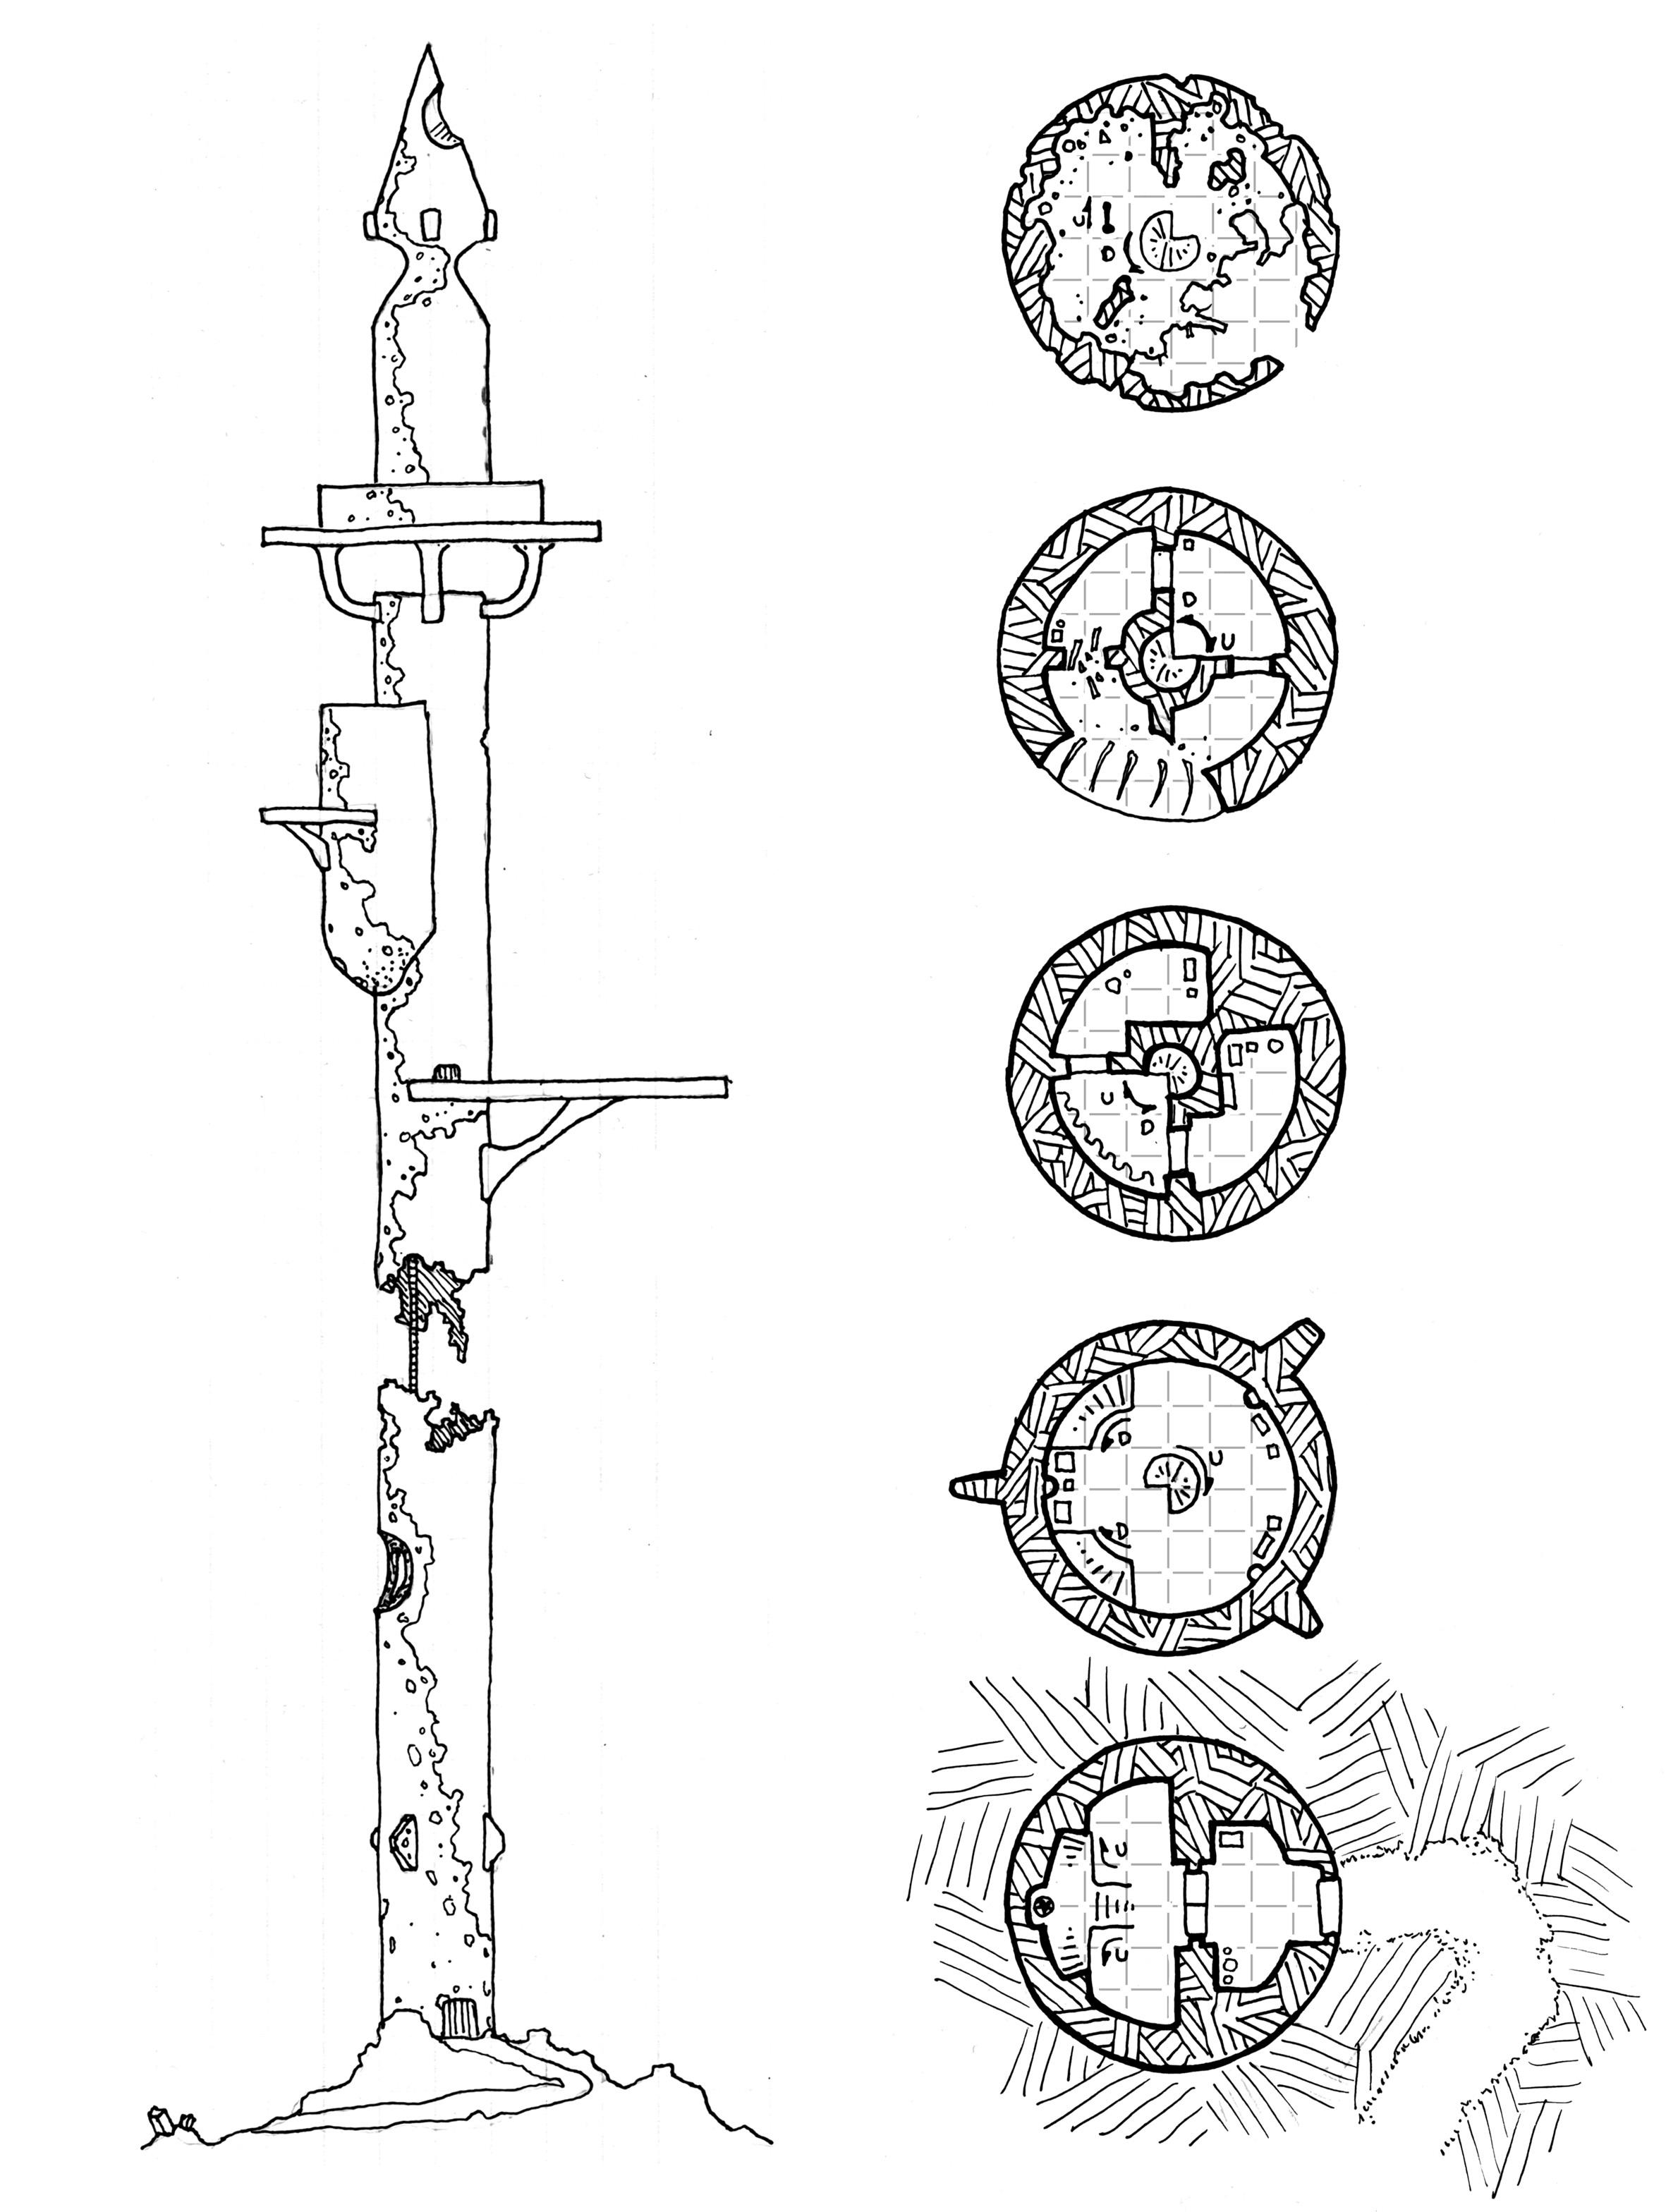 Dungeons And Dragons Map Symbols | Wiring Diagram Database